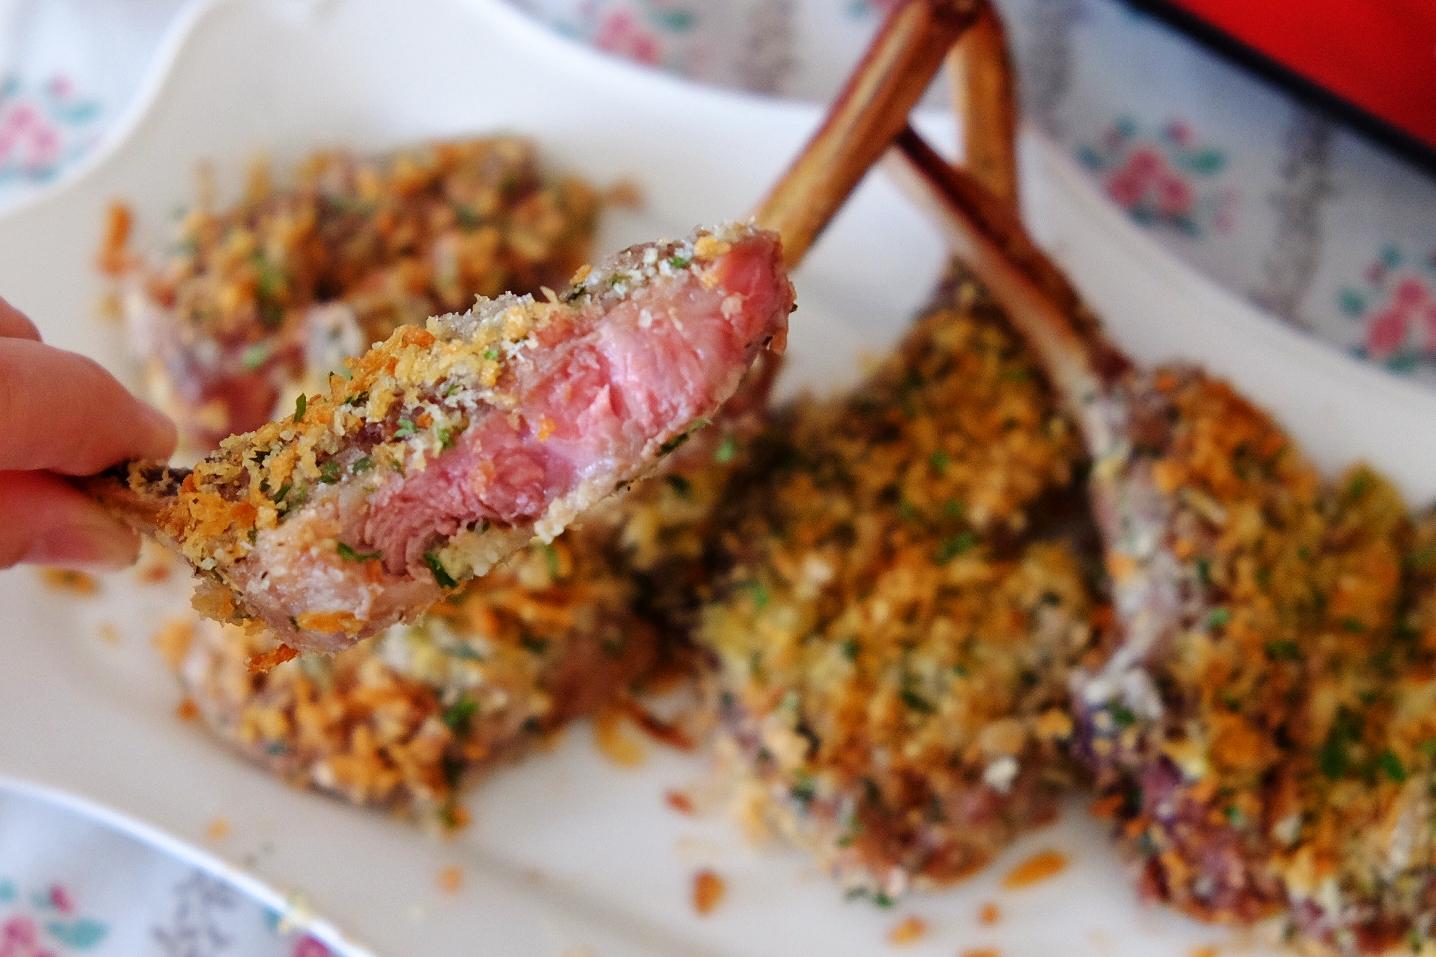 Missta's Kitchen: Recolte Avance小焗爐食譜~法式寶雲酥羊架 Provencal Lam Chop